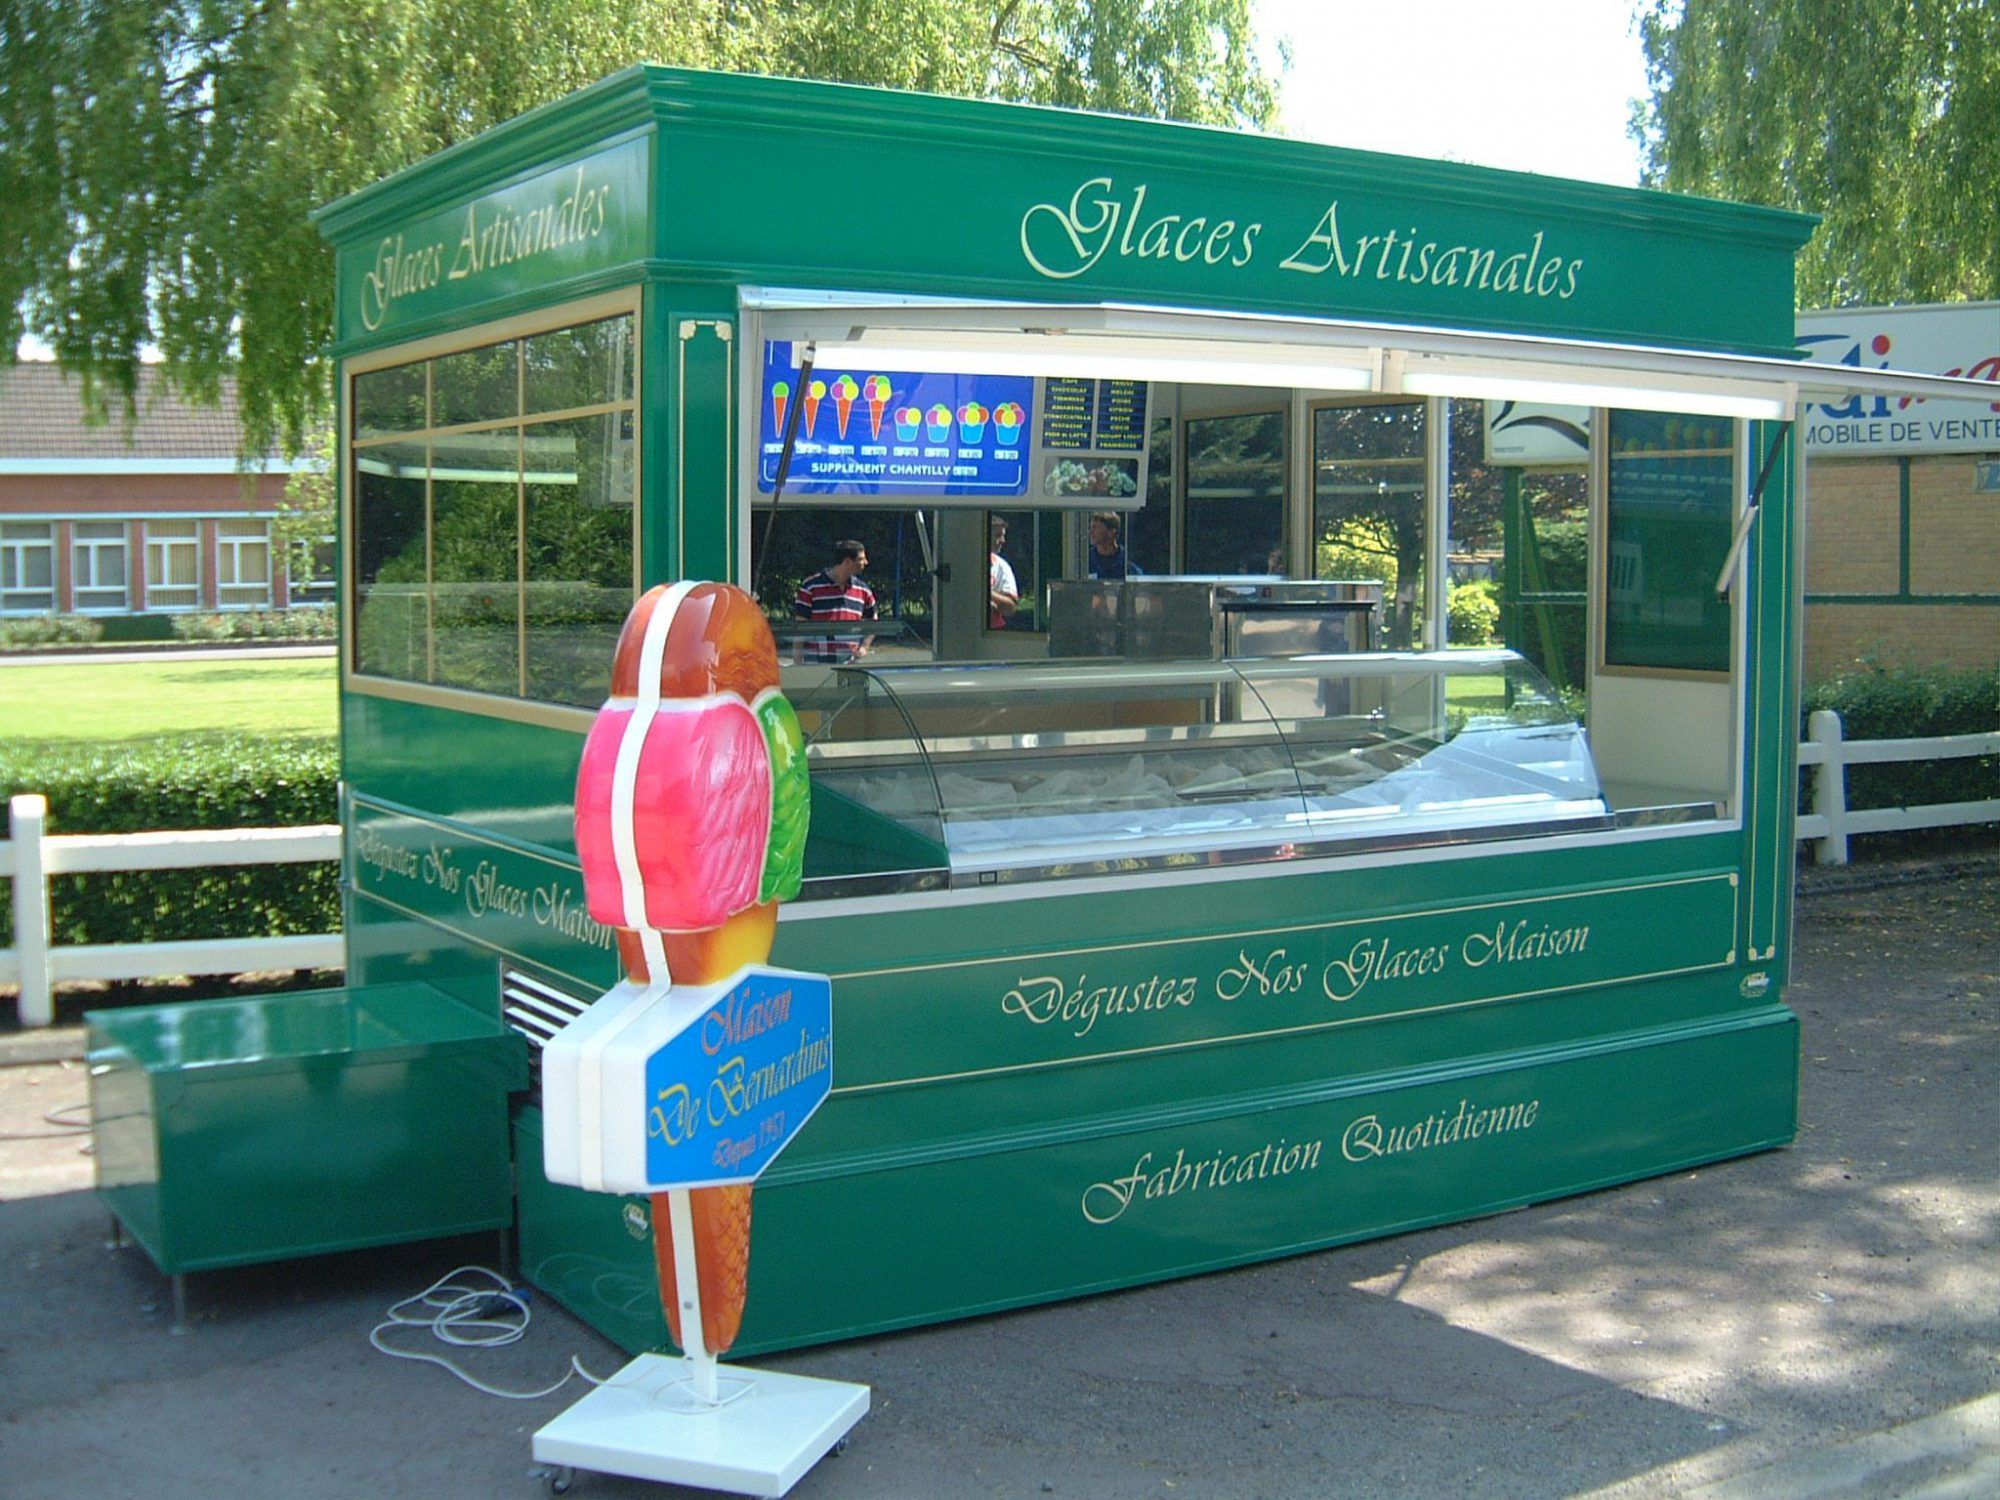 Kiosque remorque version victorien hedimag for Etalmobile occasion